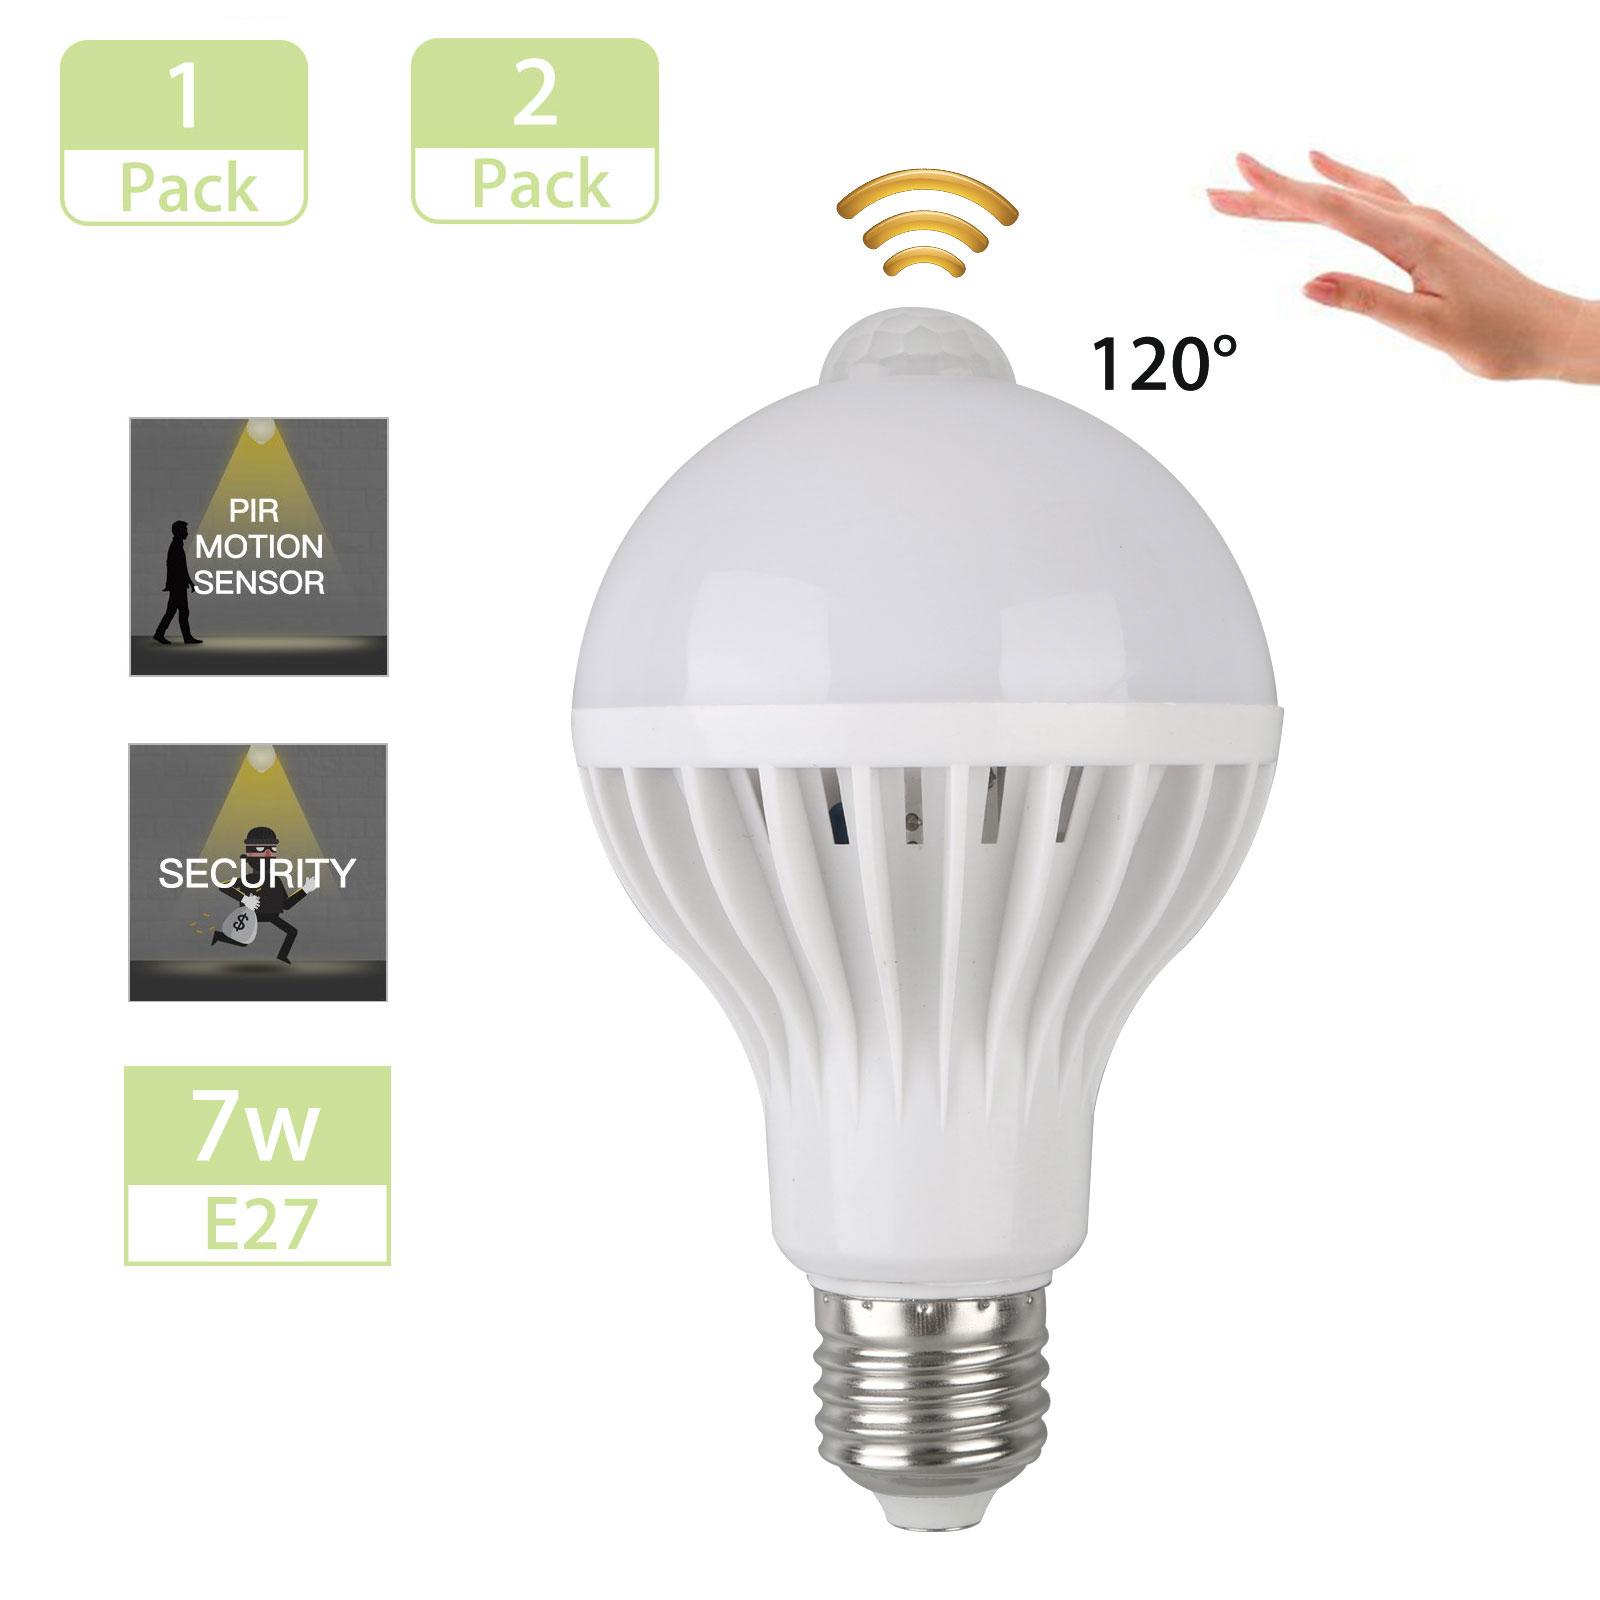 PIR-Motion-Sensor-E27-7W-9W-LED-Lamp-Bulb-Body-Infrared-Auto-Energy-Saving-Light